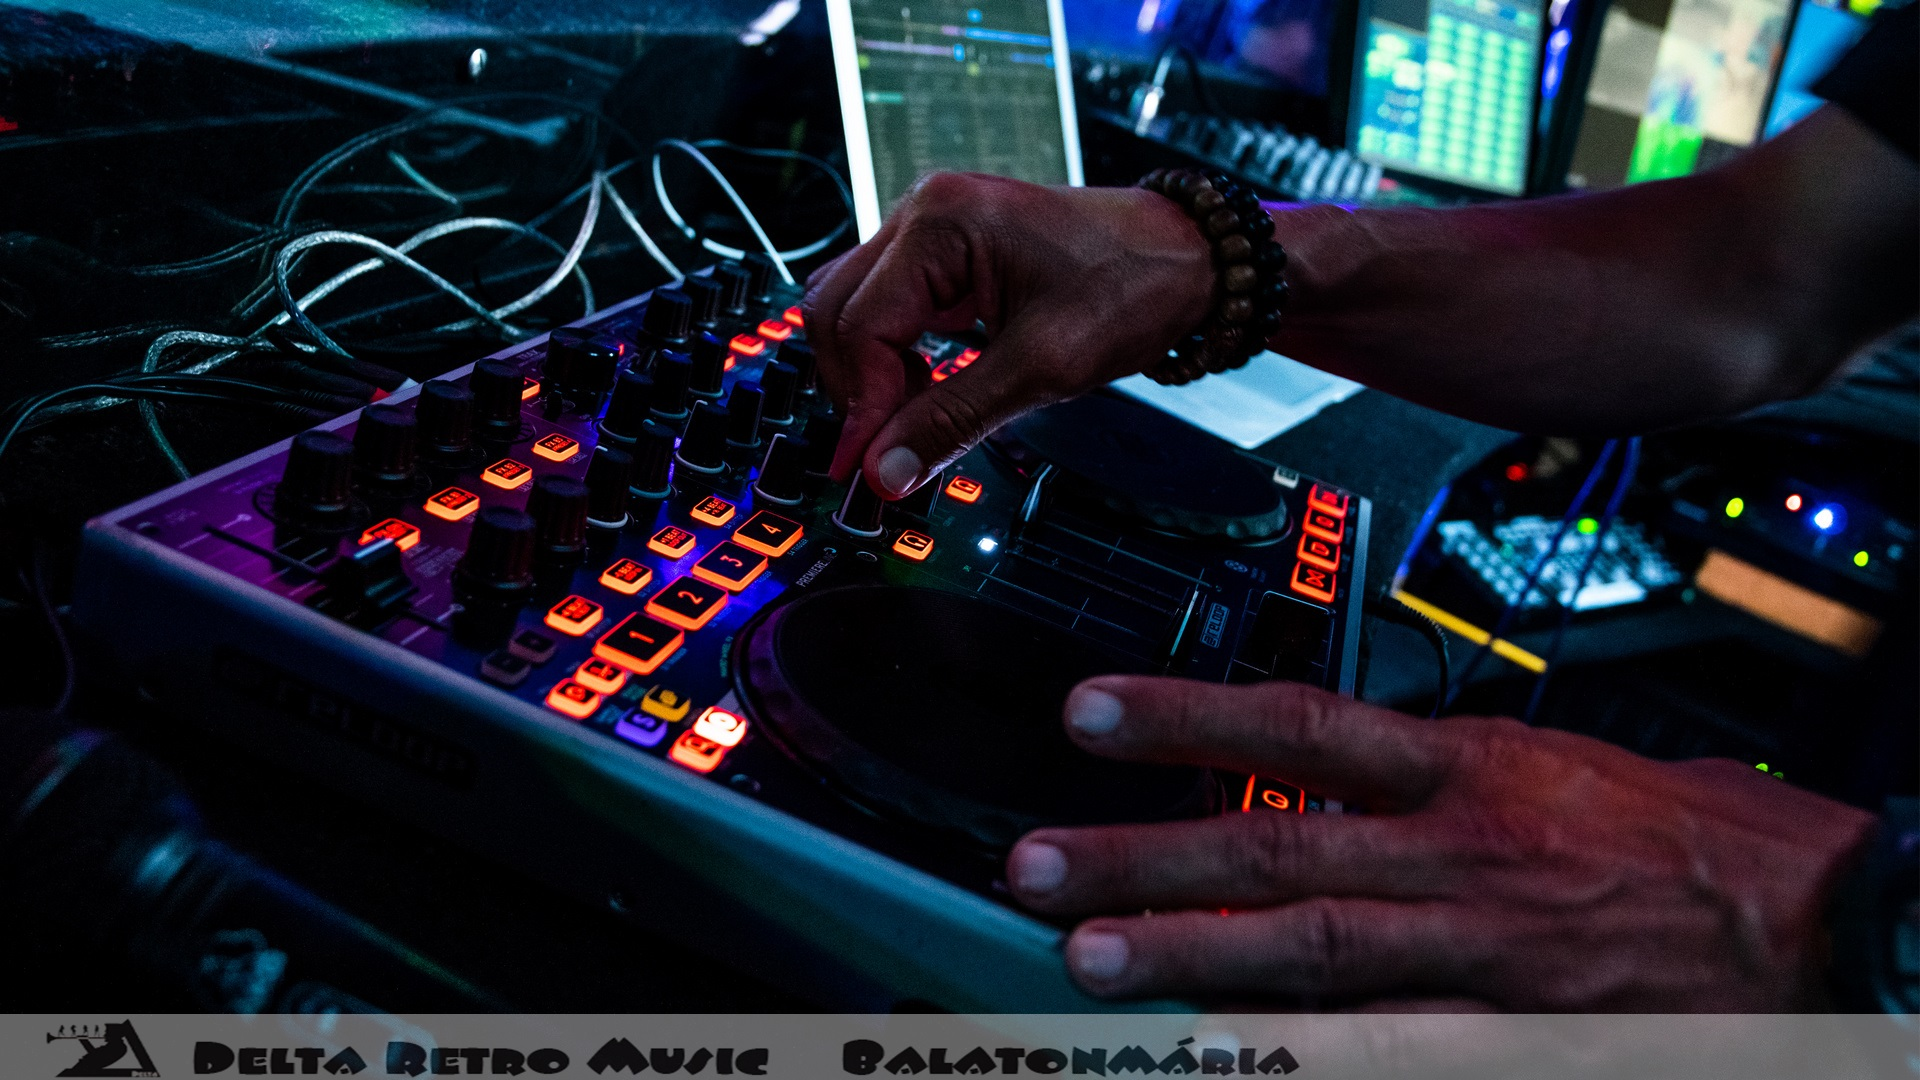 luxfunk-radio-funky-party_200807_delta retro-music-factory_062